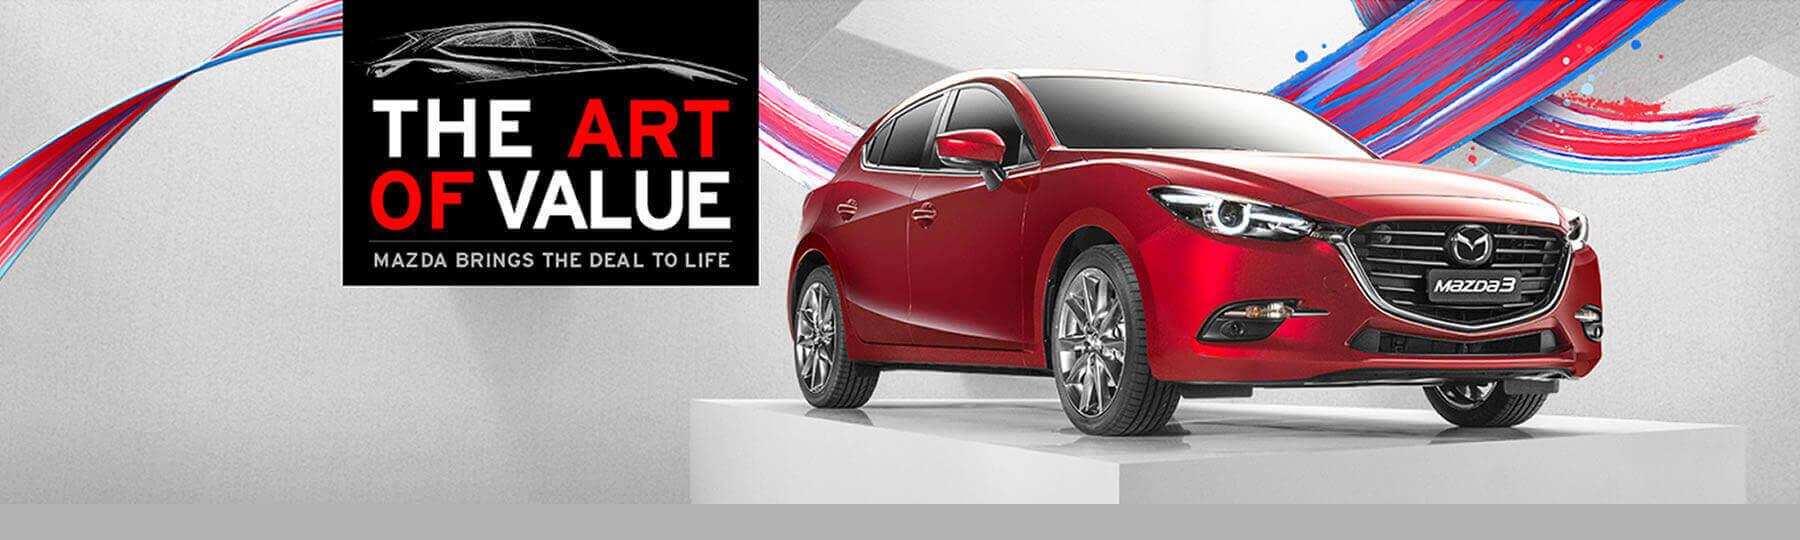 Mazda Factory Offer October